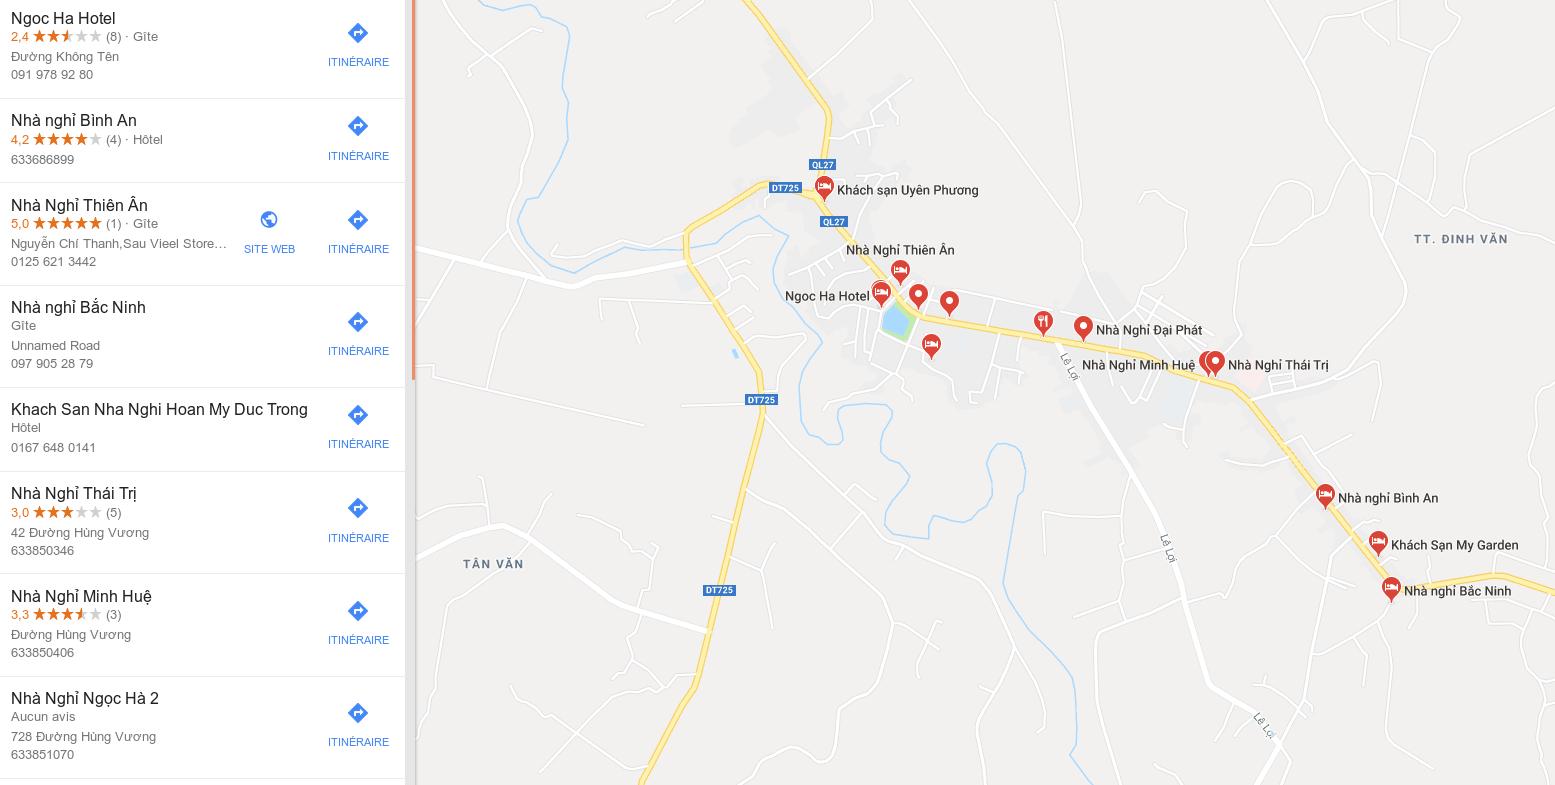 Vietnamese budget accommodations - Endless Travel